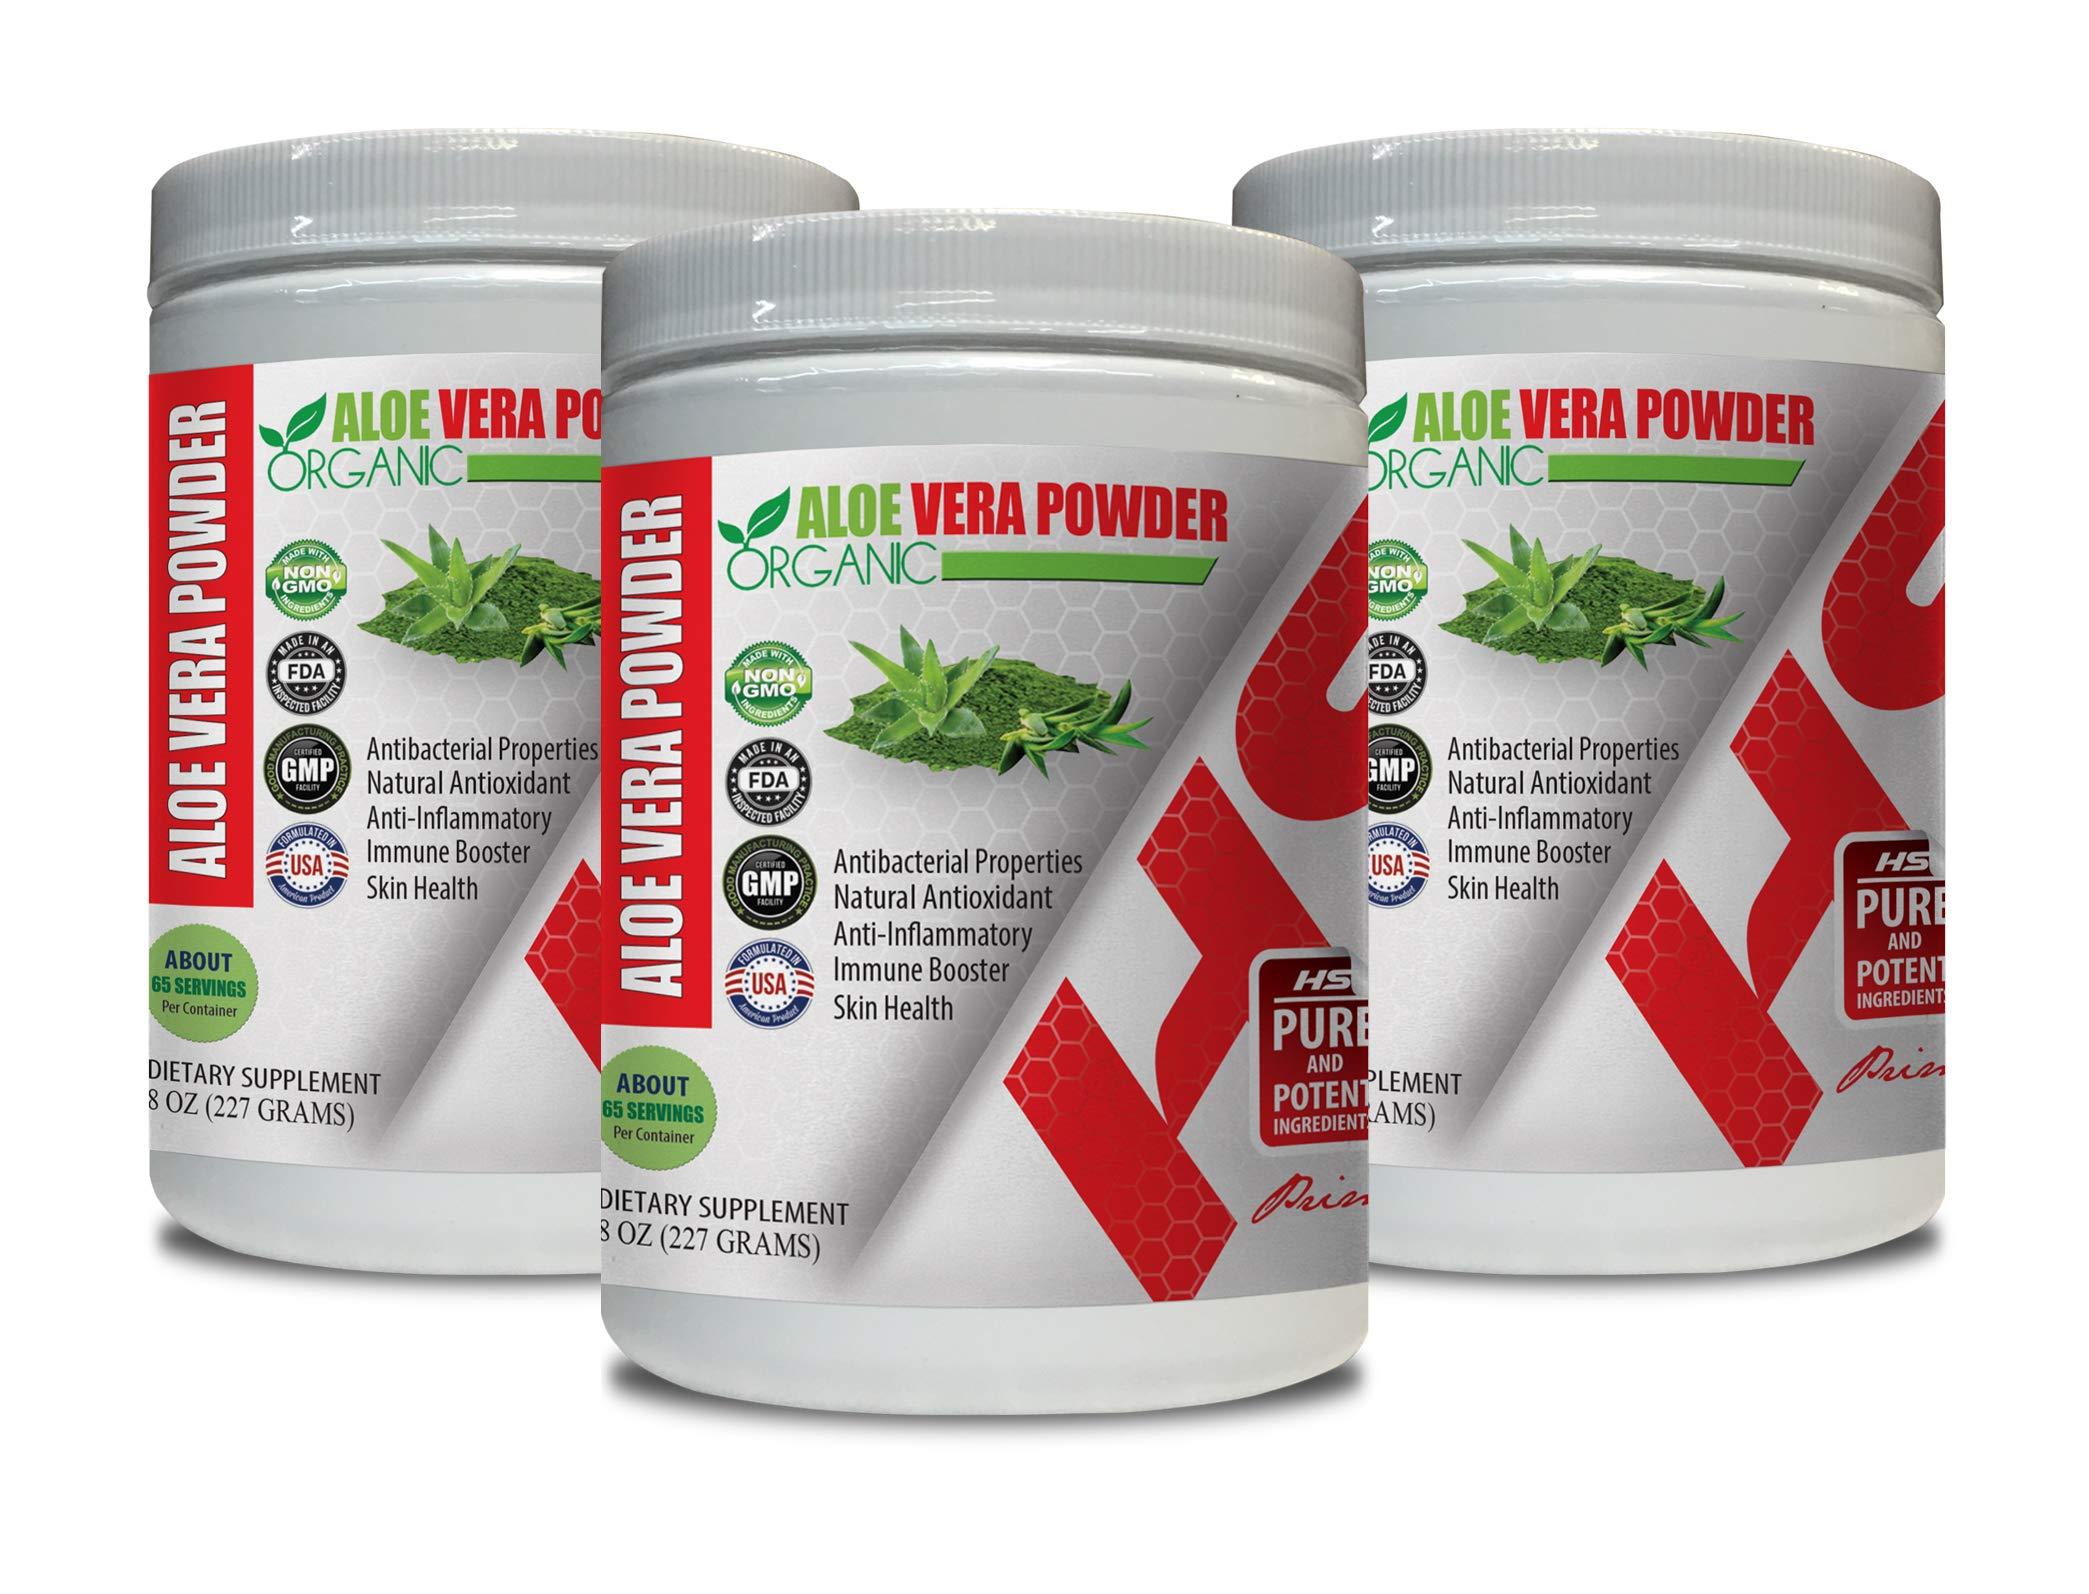 antioxidant Vitamins for Women - Aloe Vera Organic Powder - Aloe Vera Vitamins Organic for Men - 3 Cans 24 OZ (195 Servings)